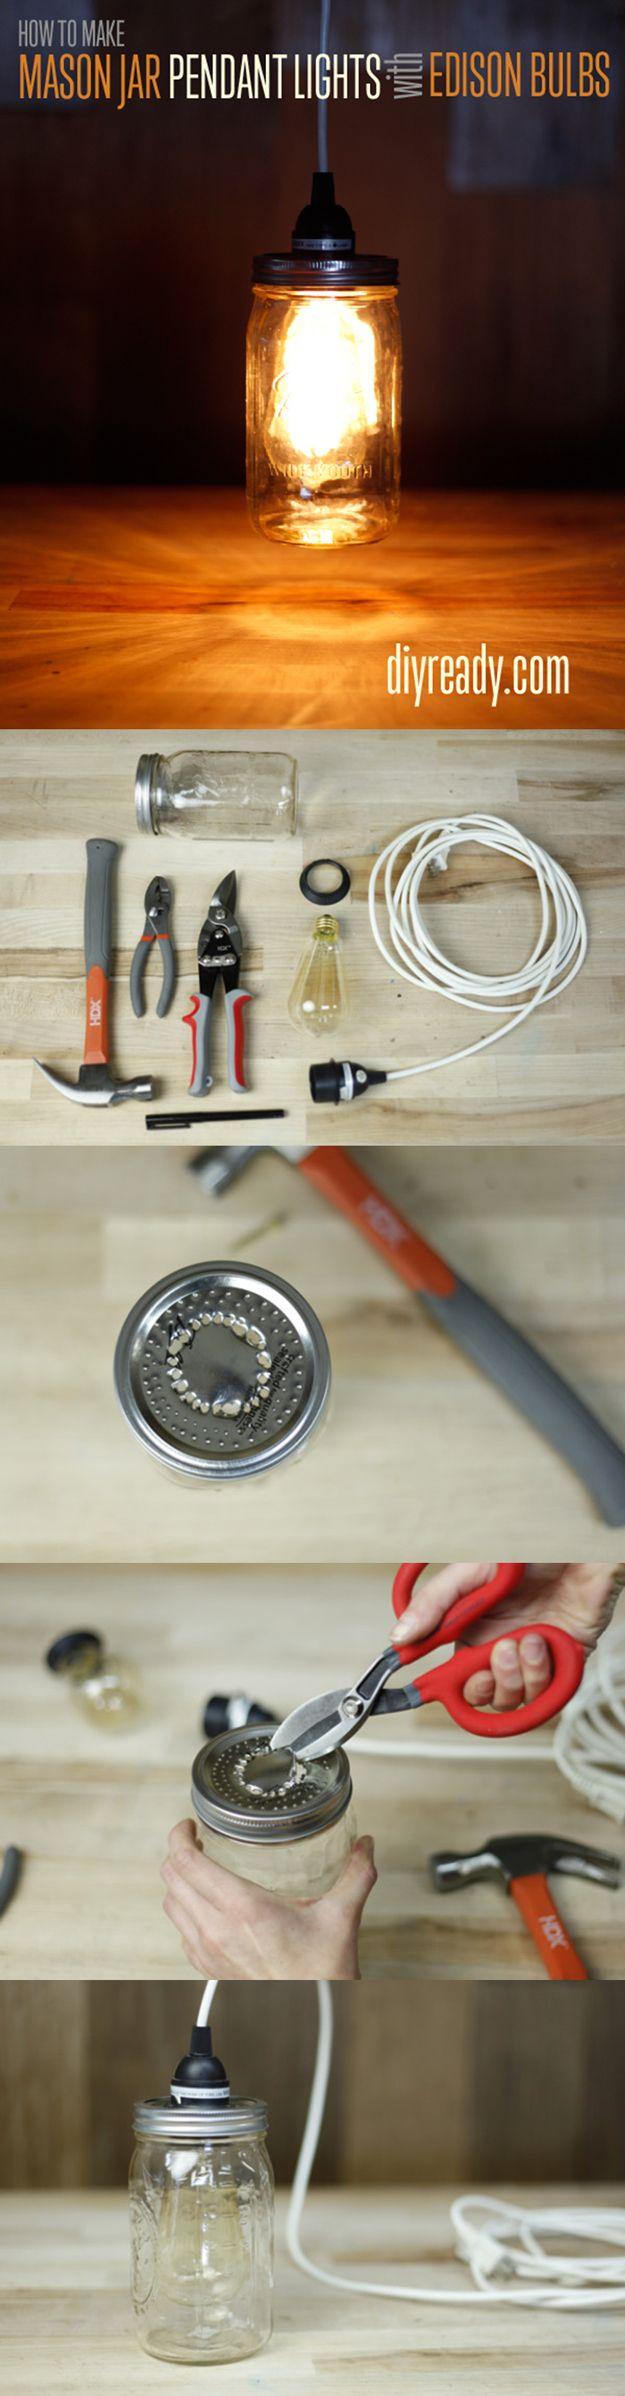 Mason Jar Pendant Lights | 26 DIY Mason Jar Crafts You Can Make In Under an Hour at http://diyready/com/mason-jar-crafts-in-under-an-hour